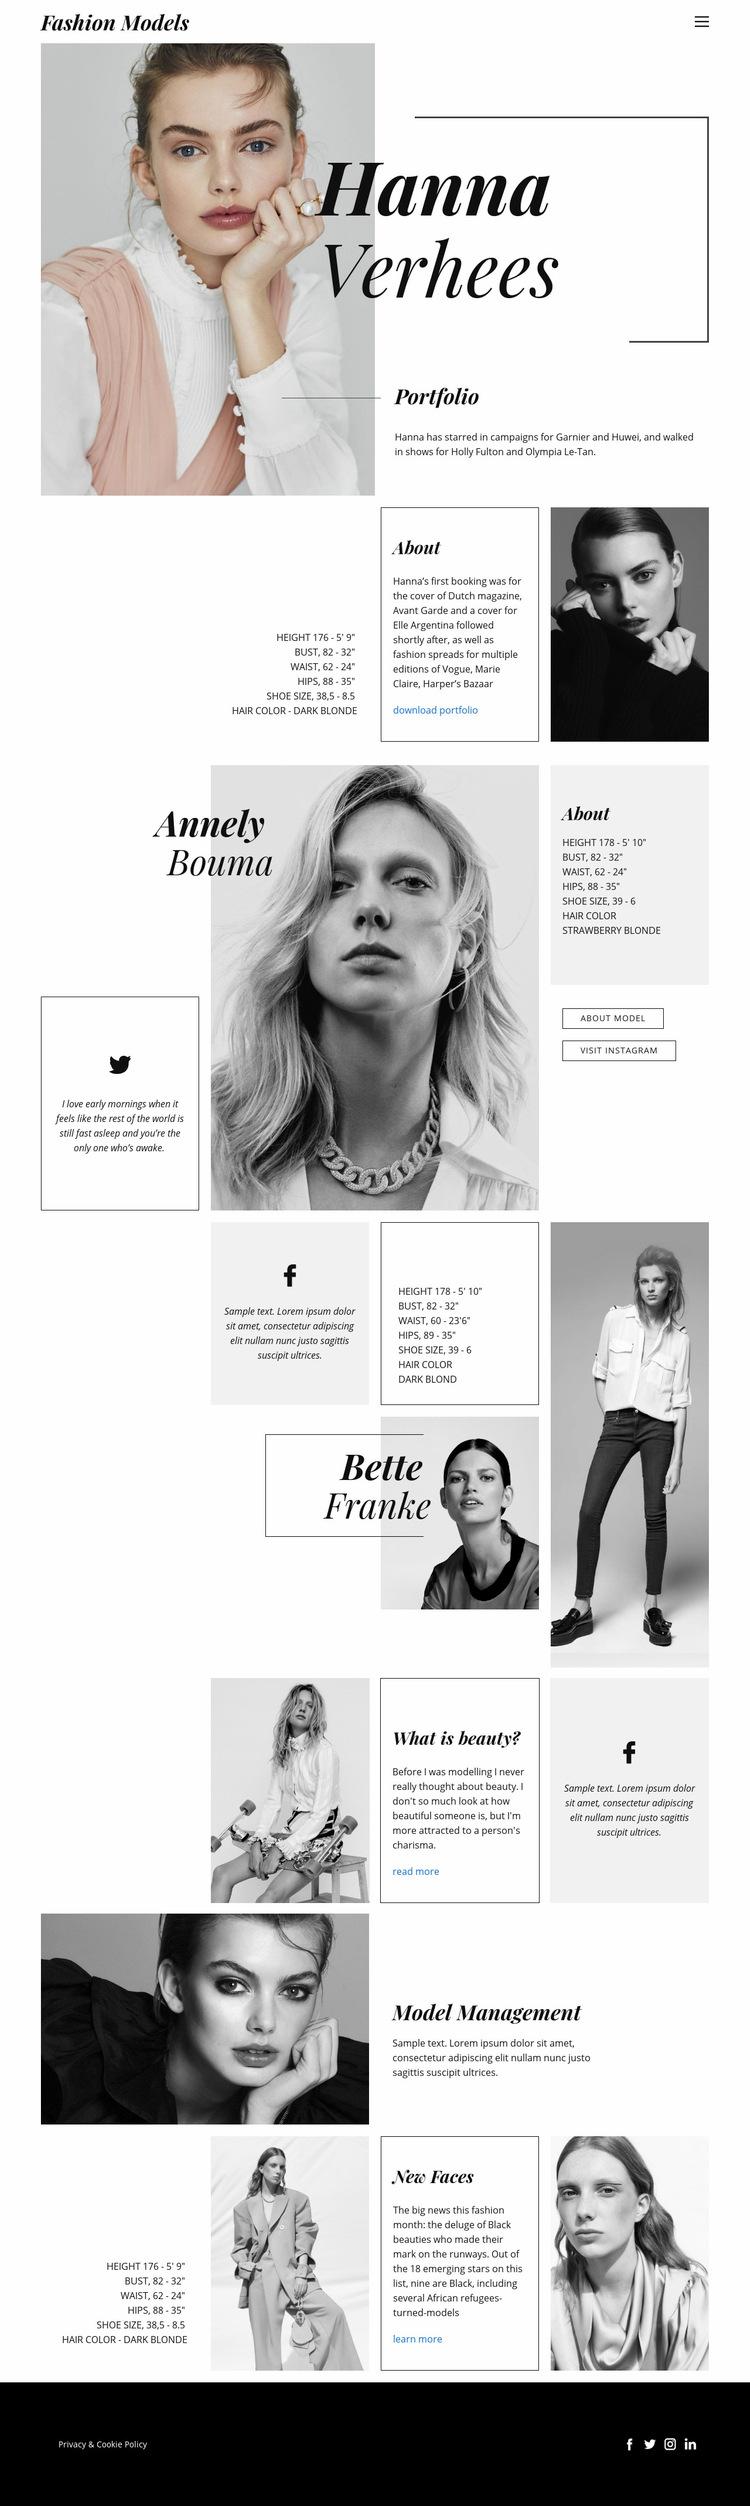 Hanna Verhees Blog Web Page Design